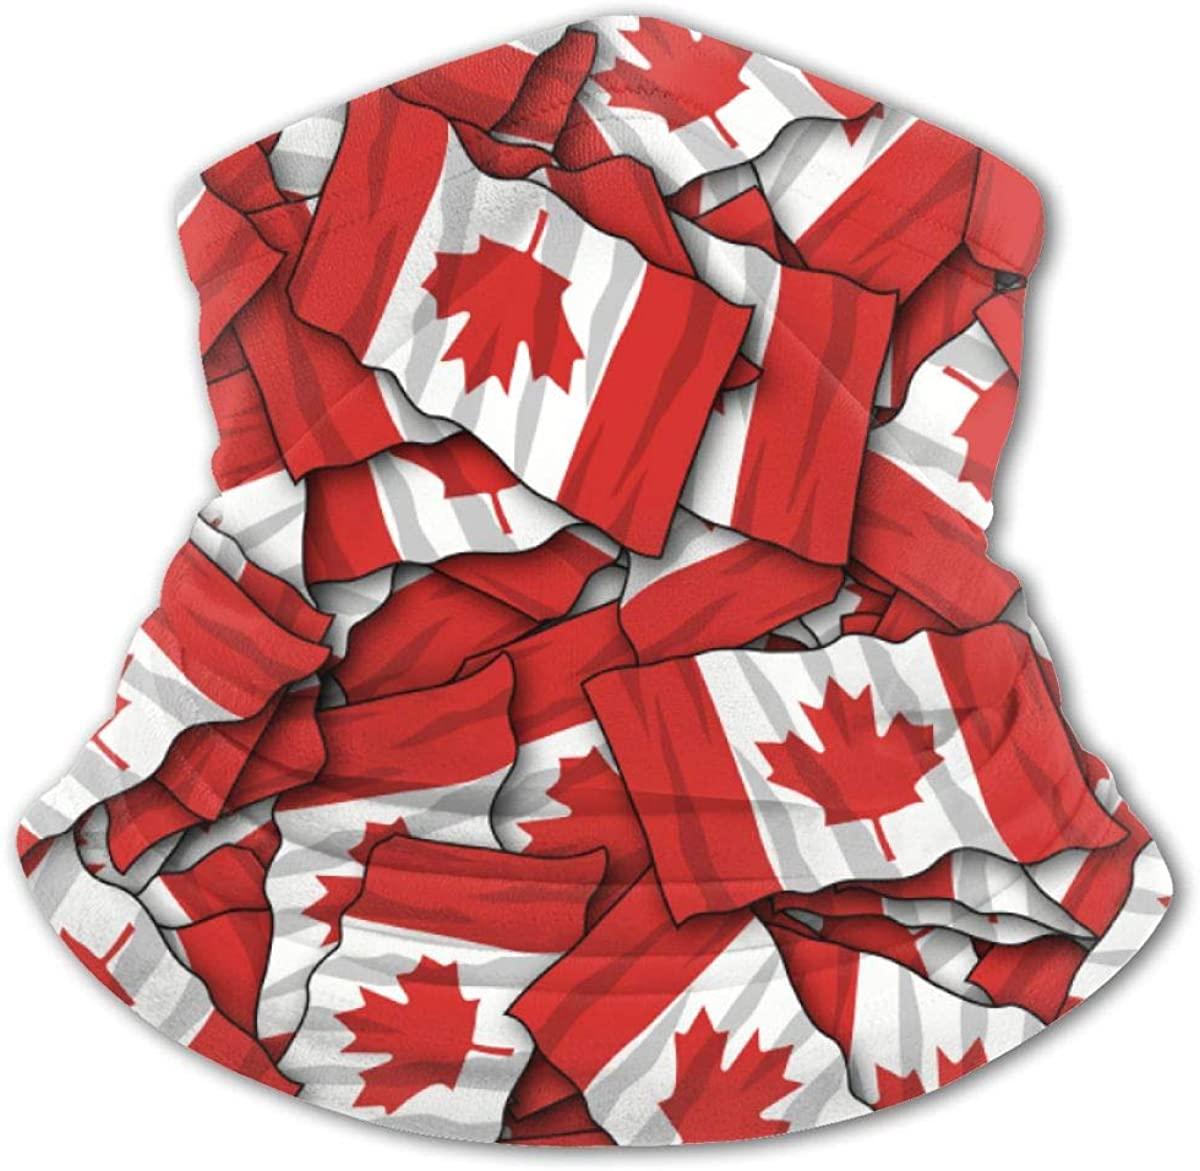 Canadian Flag Headwear For Girls And Boys, Head Wrap, Neck Gaiter, Headband, Tenn Fishing Mask, Magic Scarf, Tube Mask, Face Bandana Mask For Camping Running Cycling